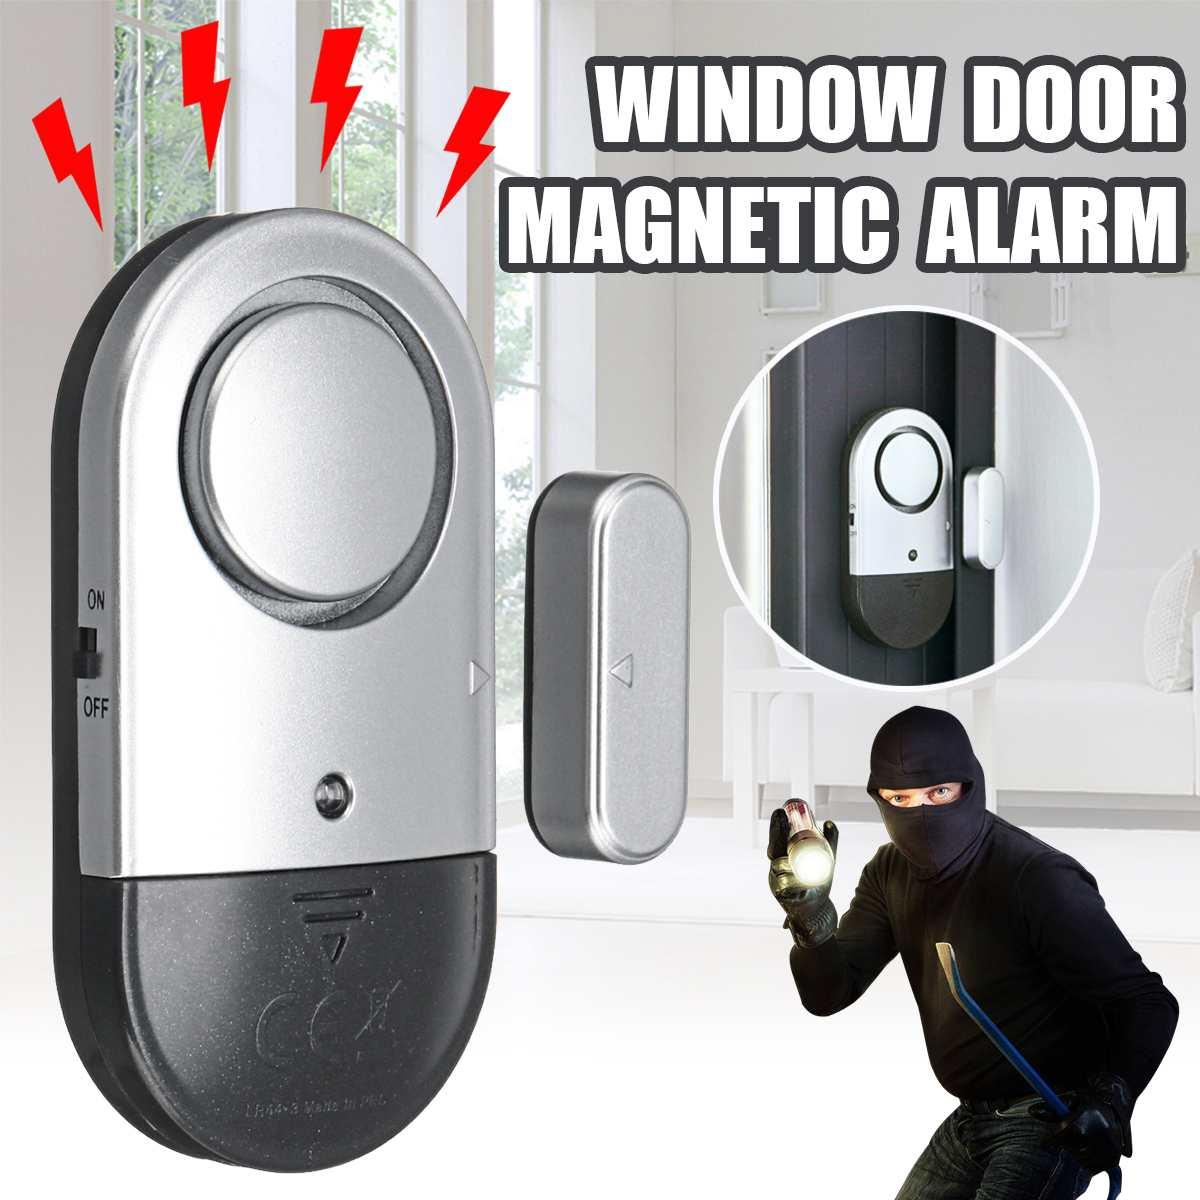 120DB Super Loud Sound Alarm Sensor Mini Window Door Sensor Wireless Burglar Alarm With Magnetic Sensor Home Security System Kit